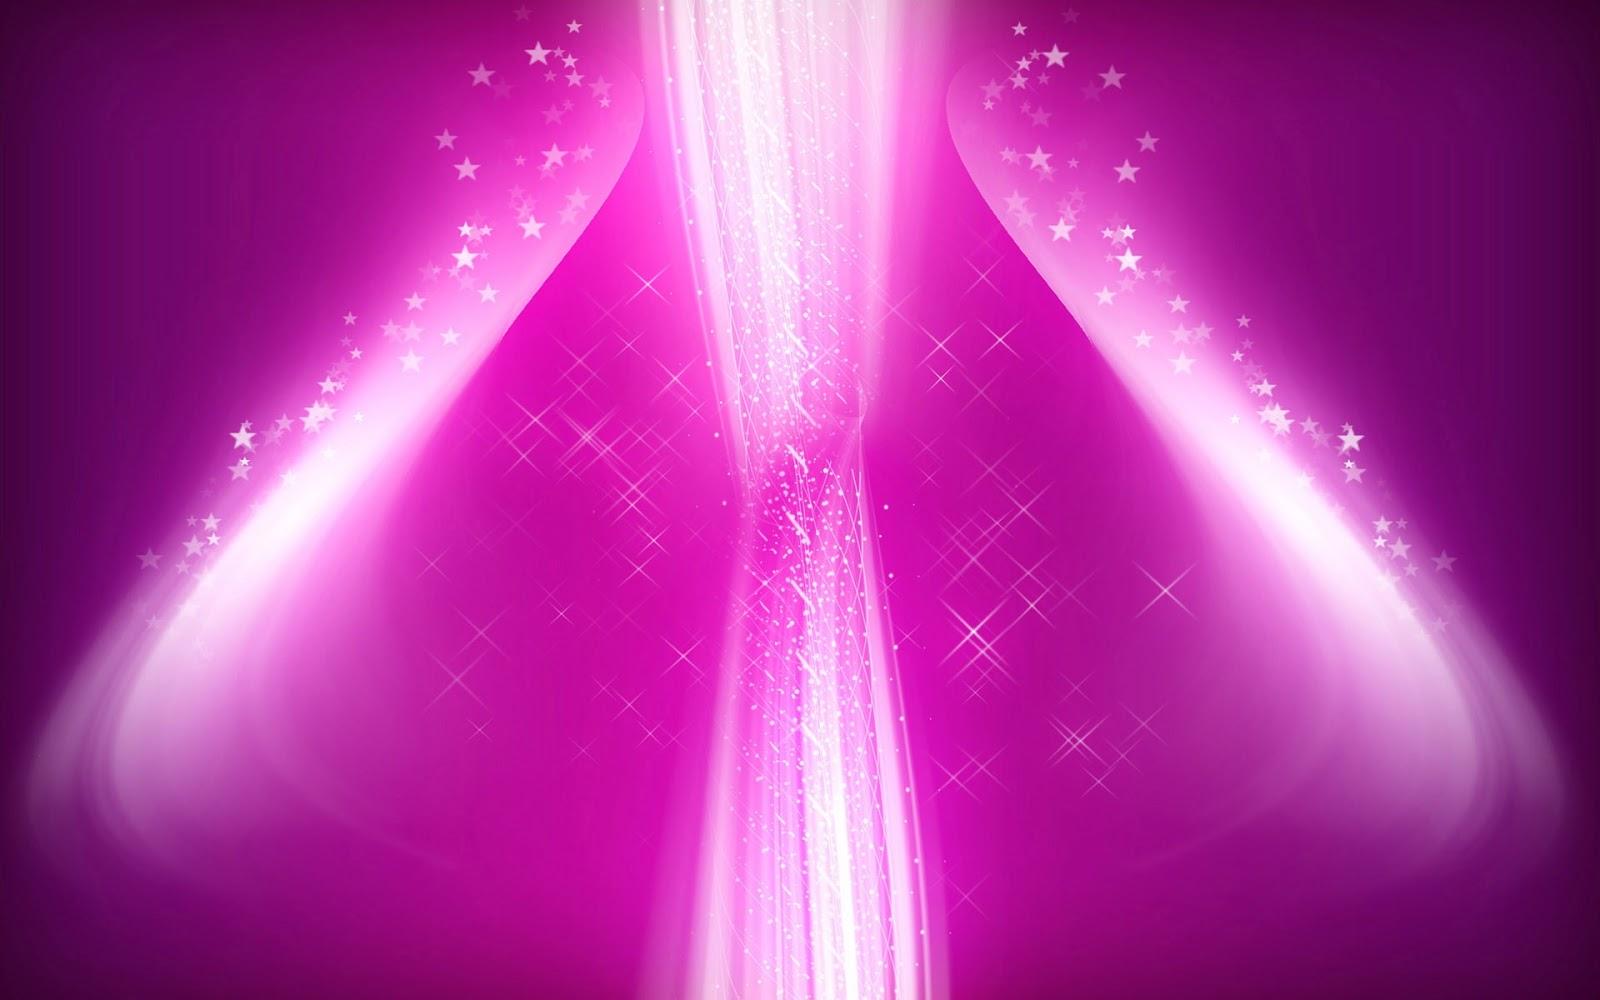 Pink Wallpaper hd , Pink Background Wallpaper hd - Photos pink